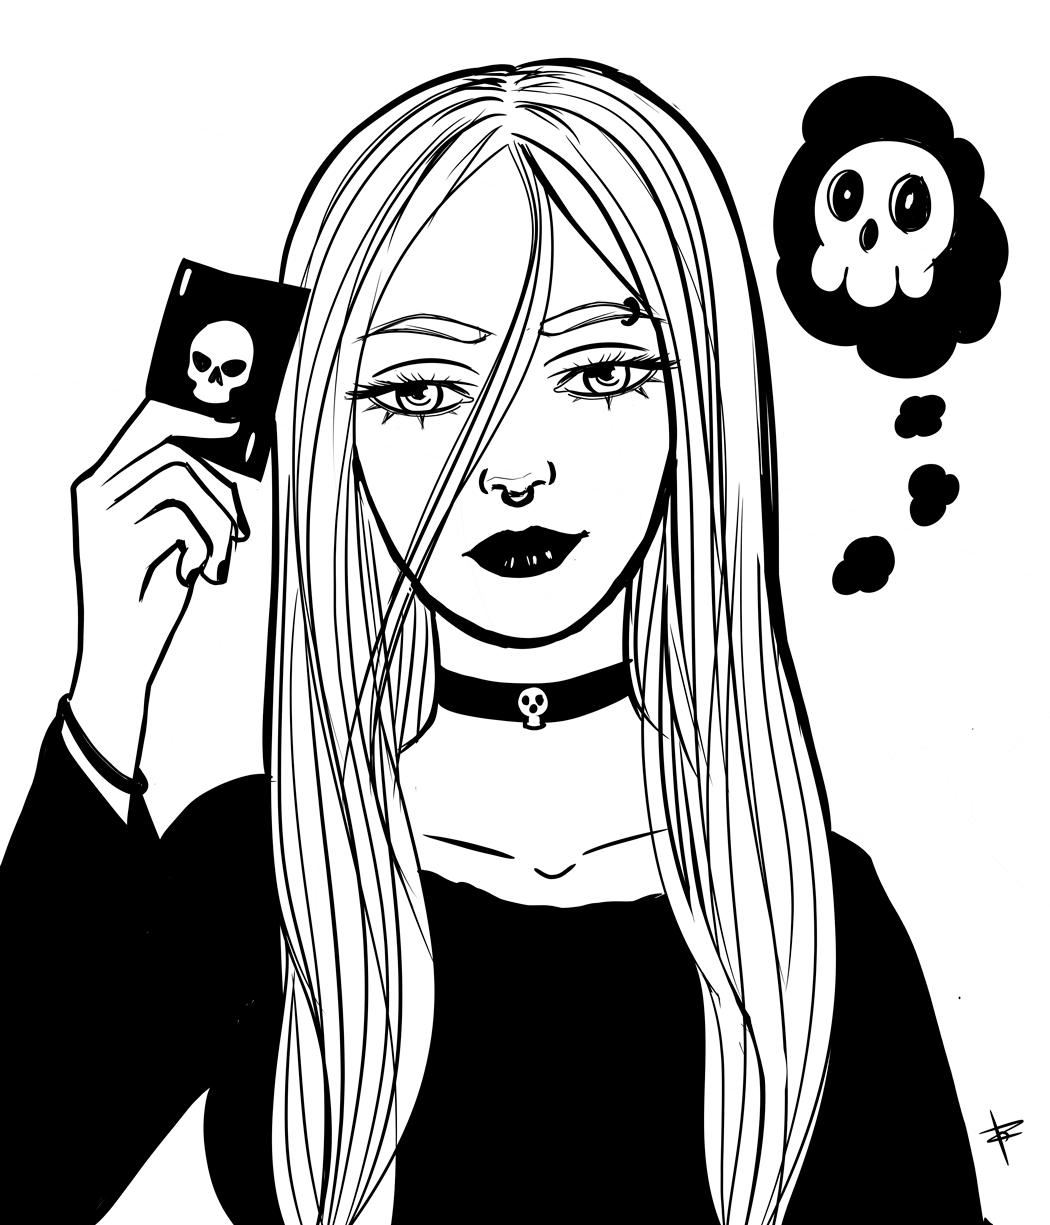 Deathgirl_395186.png